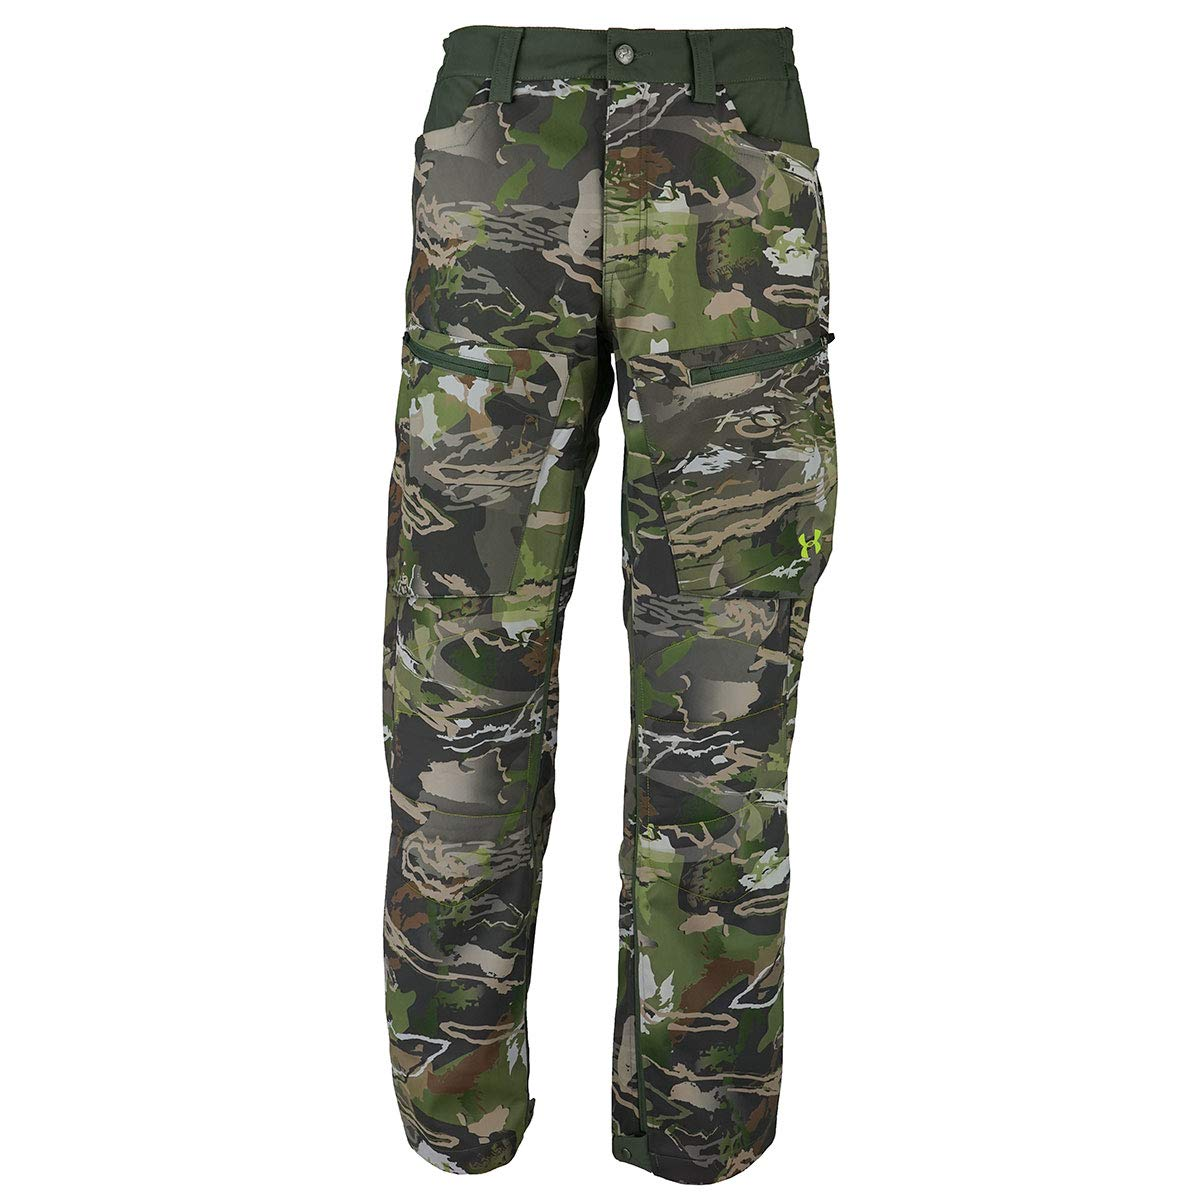 98d096fb24ba5 Amazon.com: Under Armour Men's UA Storm Softershell Hunting Pants Ridge  Reaper Forest 2XL: Sports & Outdoors